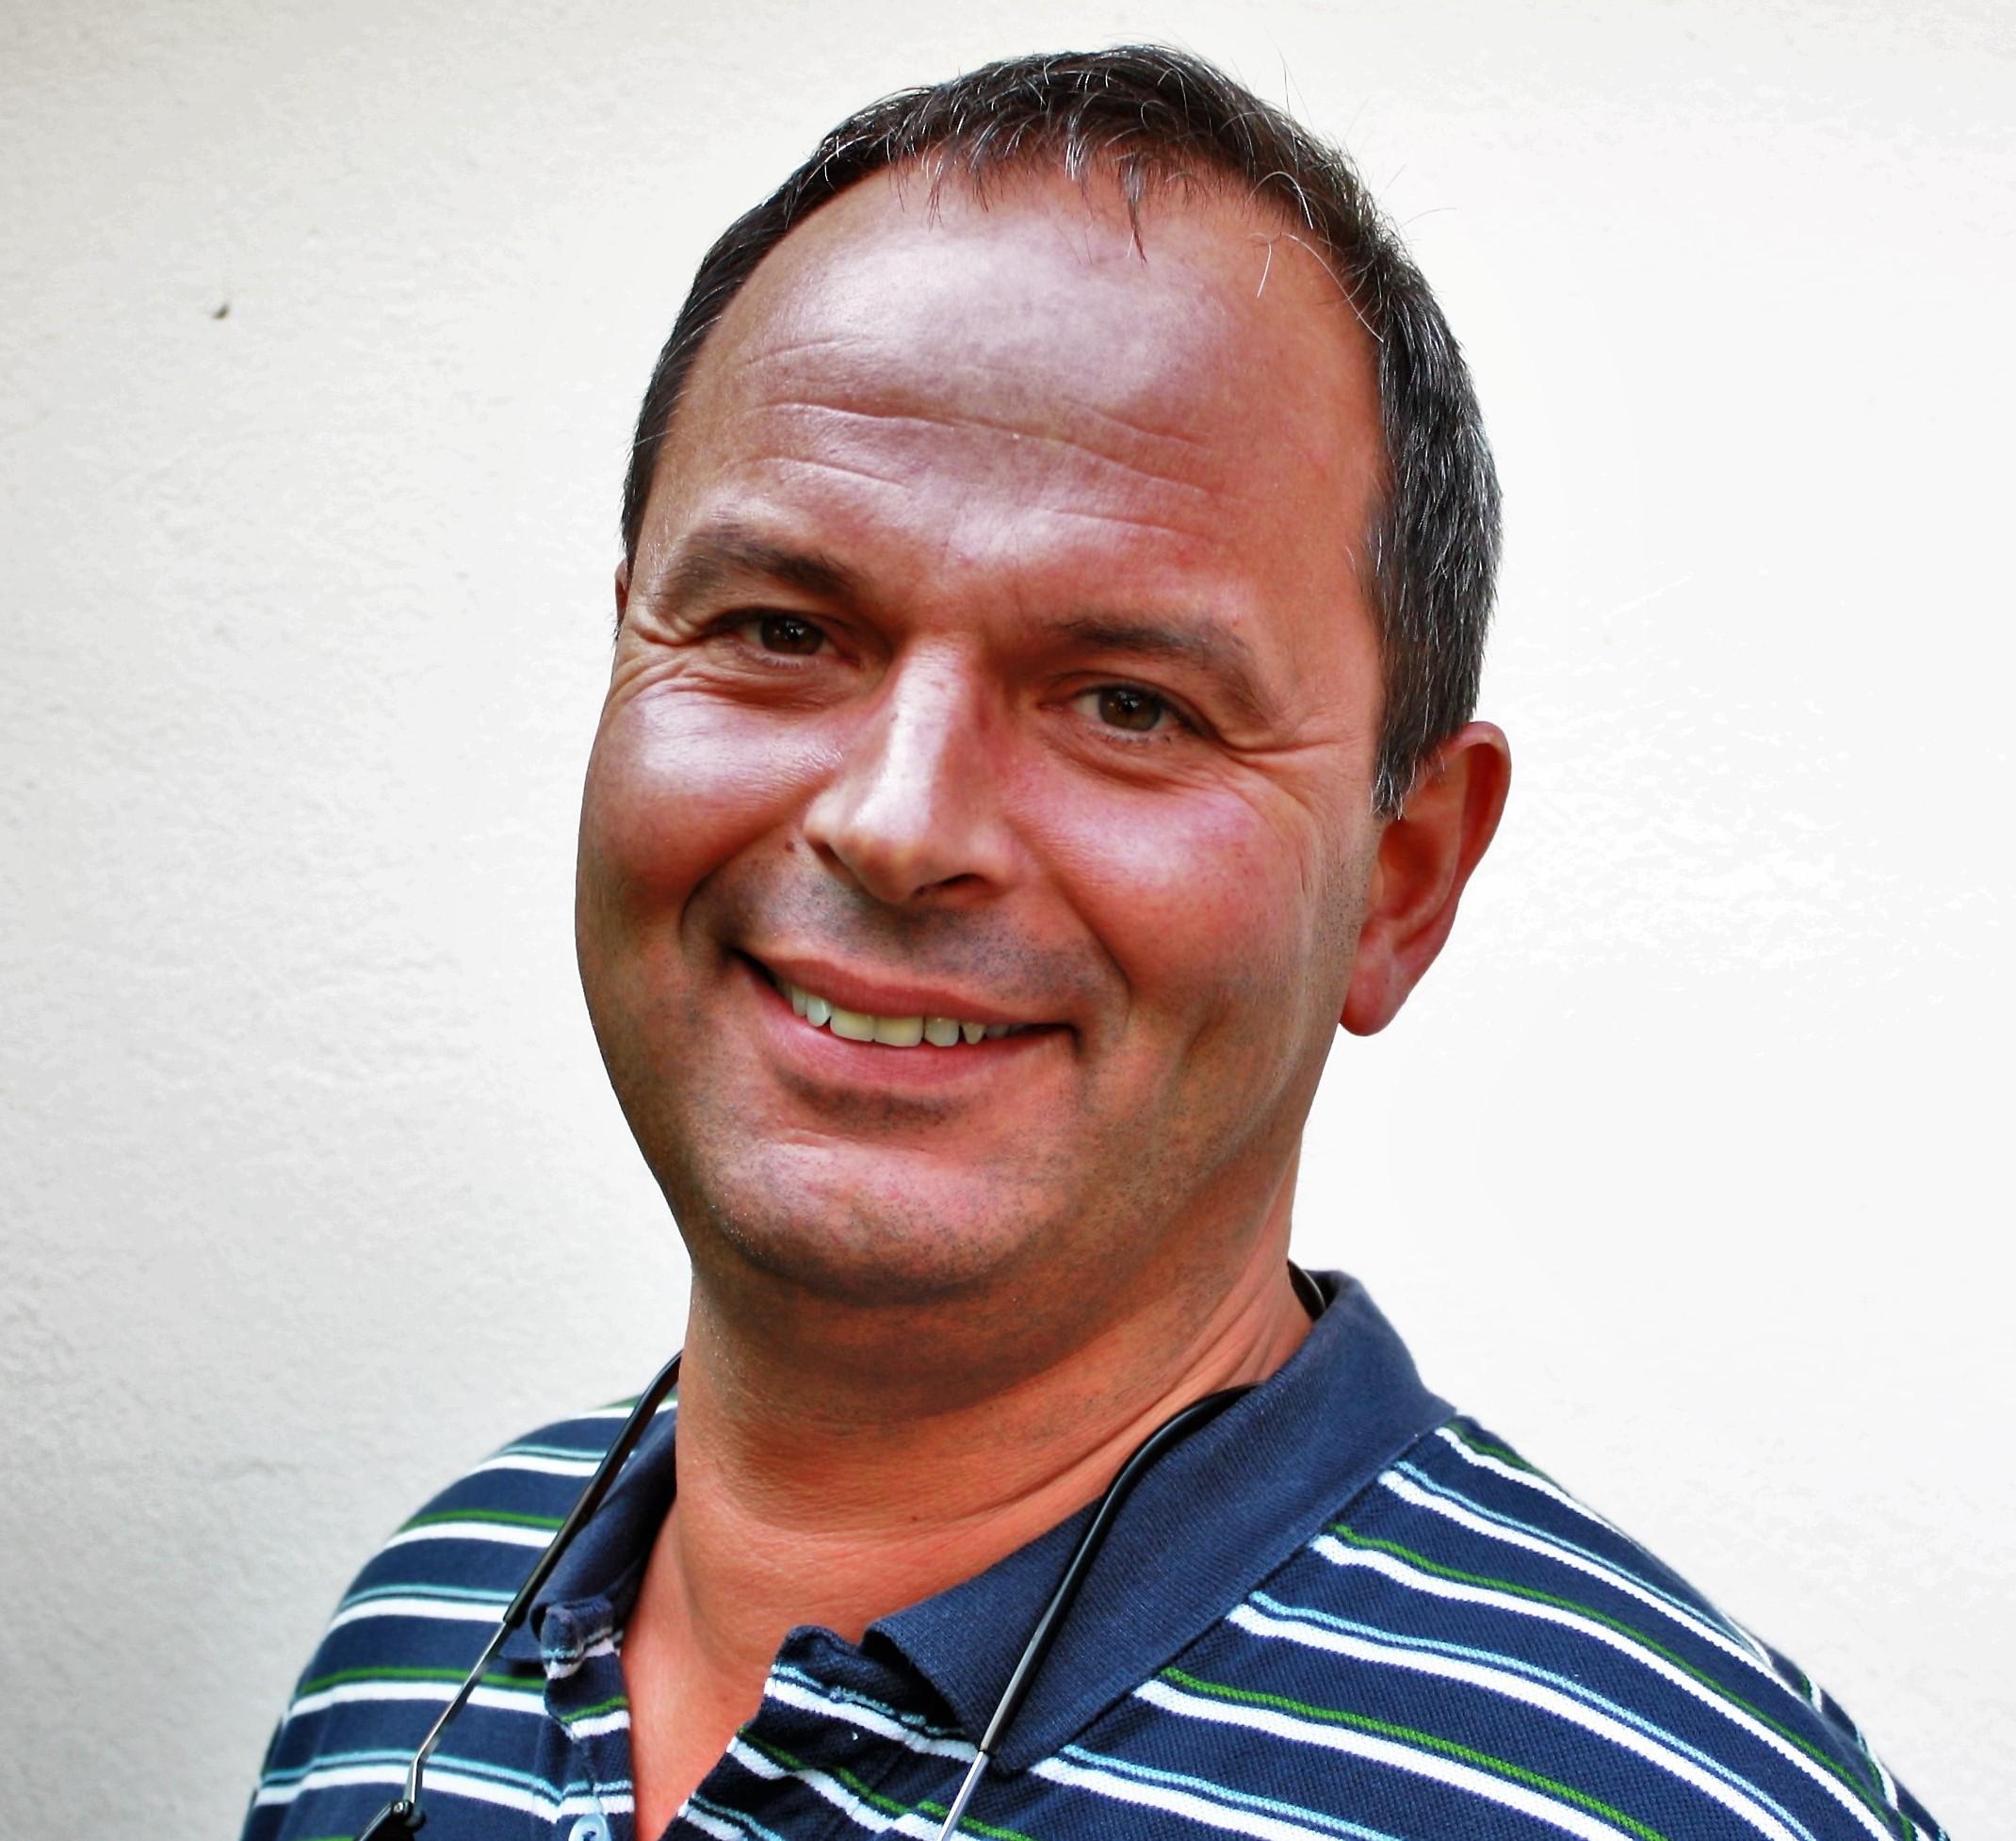 Christoph Hassenbach